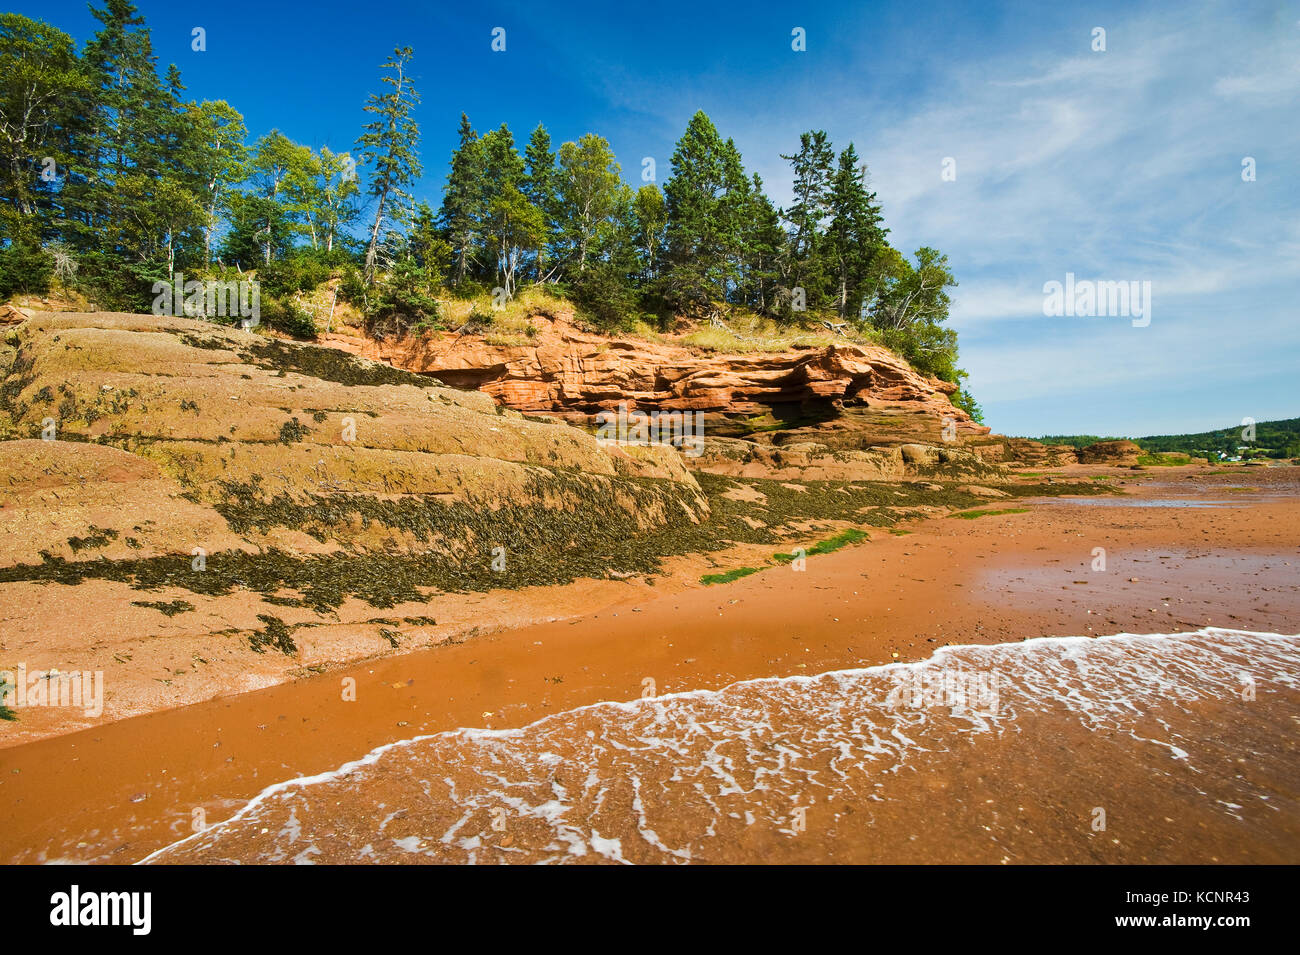 outgoing tide/sandstone shoreline, near Lower Economy in the Minas Basin, Bay of Fundy, Nova Scotia - Stock Image